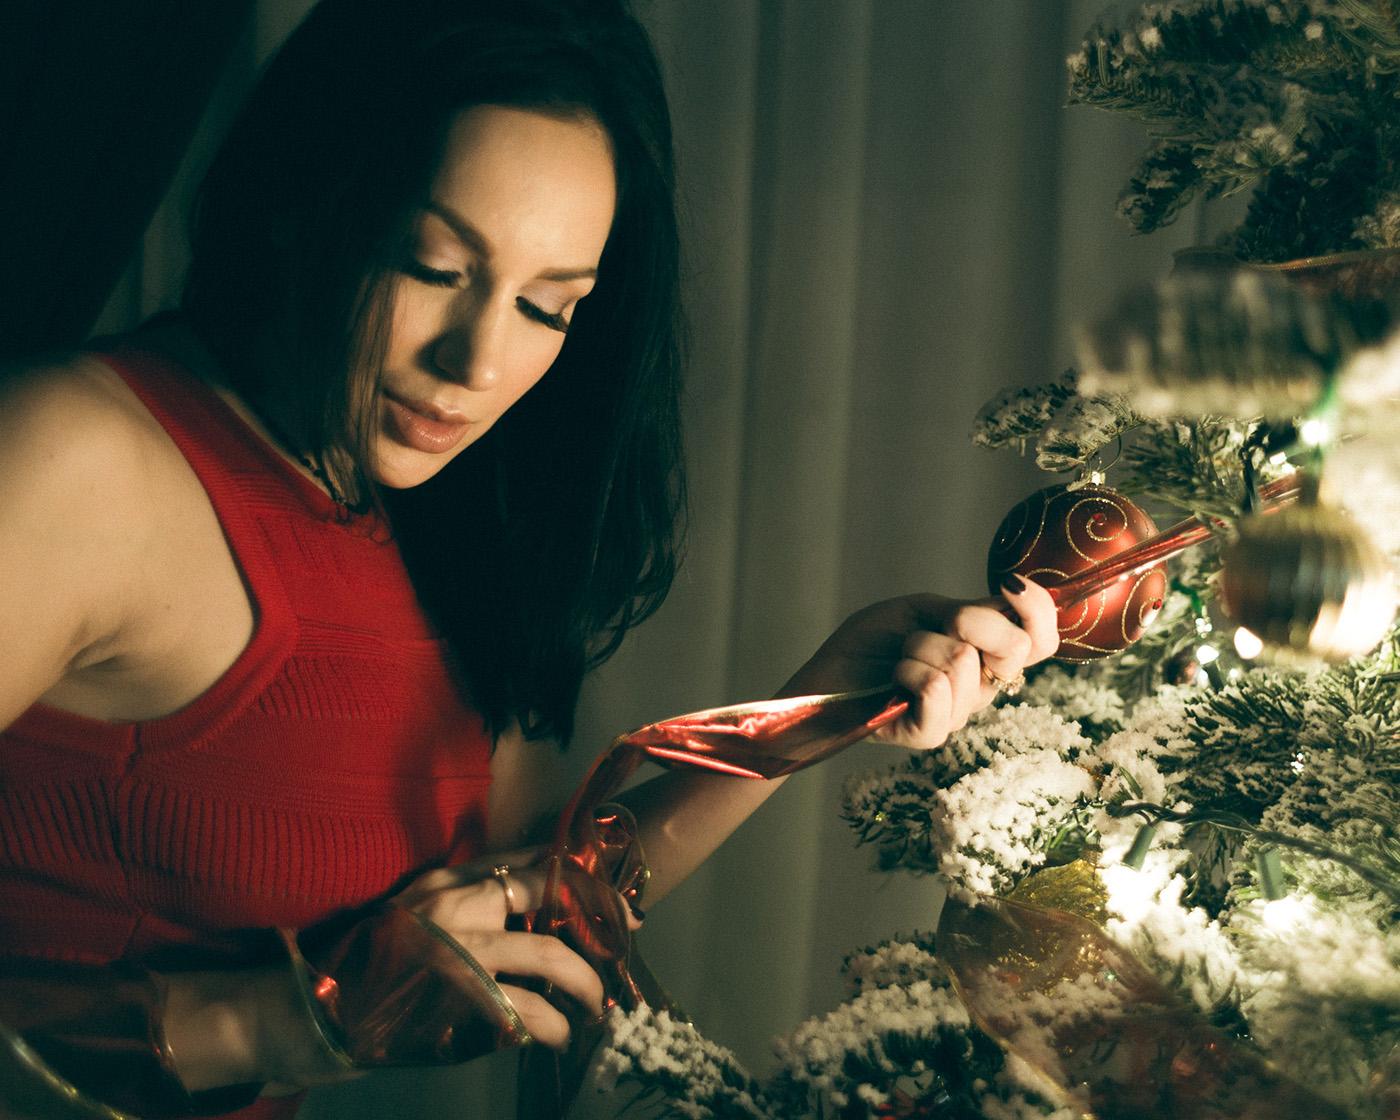 Рождество Кьяры - A Kiera Christmas / Mike B